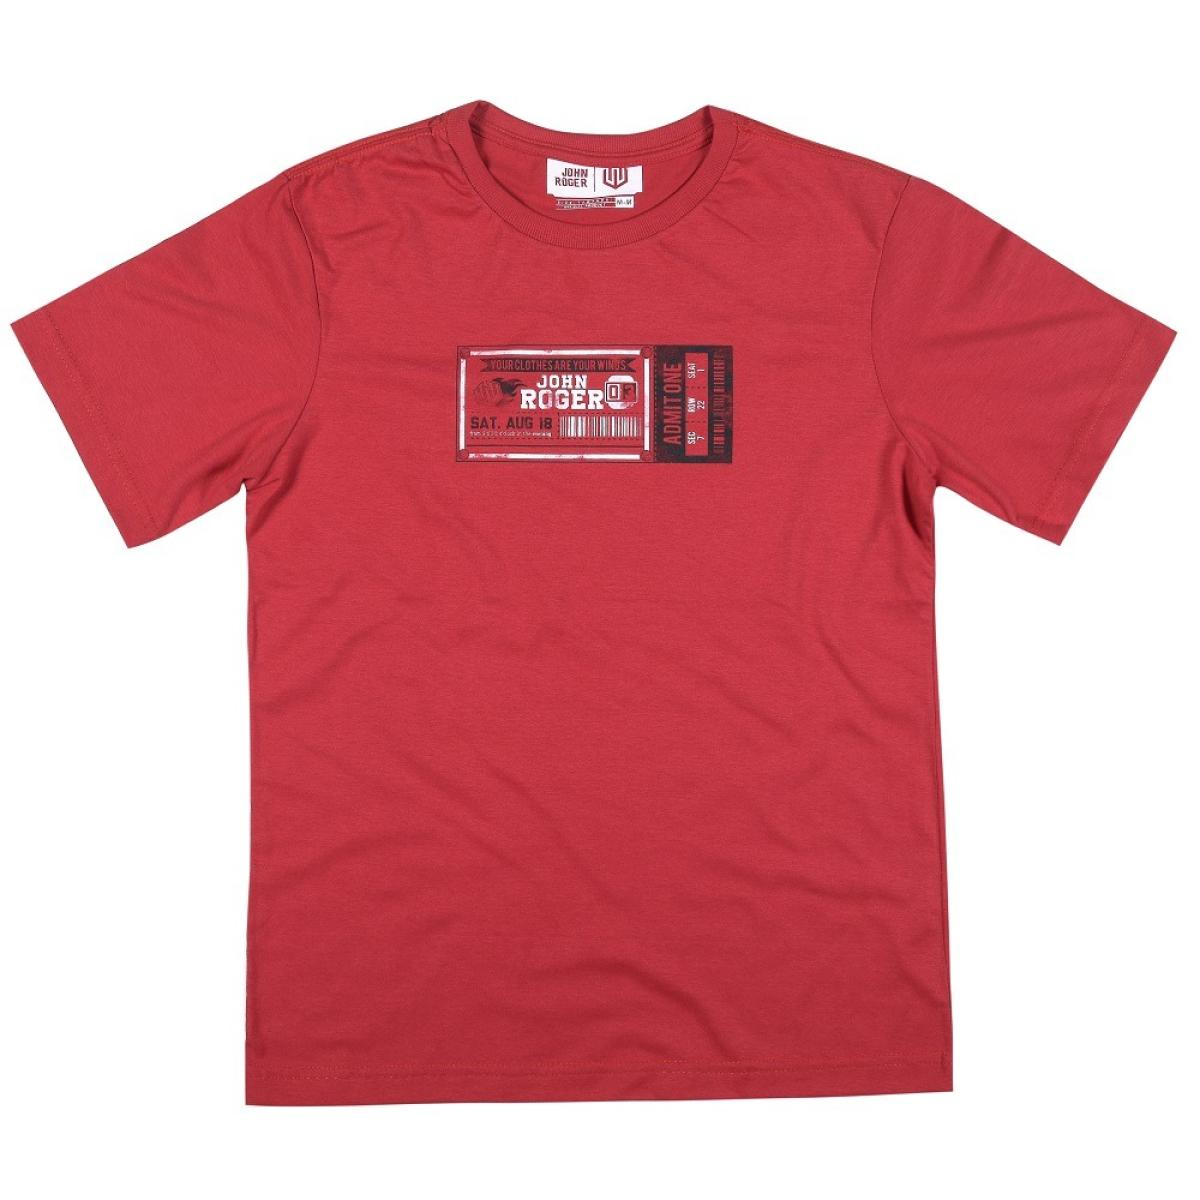 Camiseta John Roger - Ticket